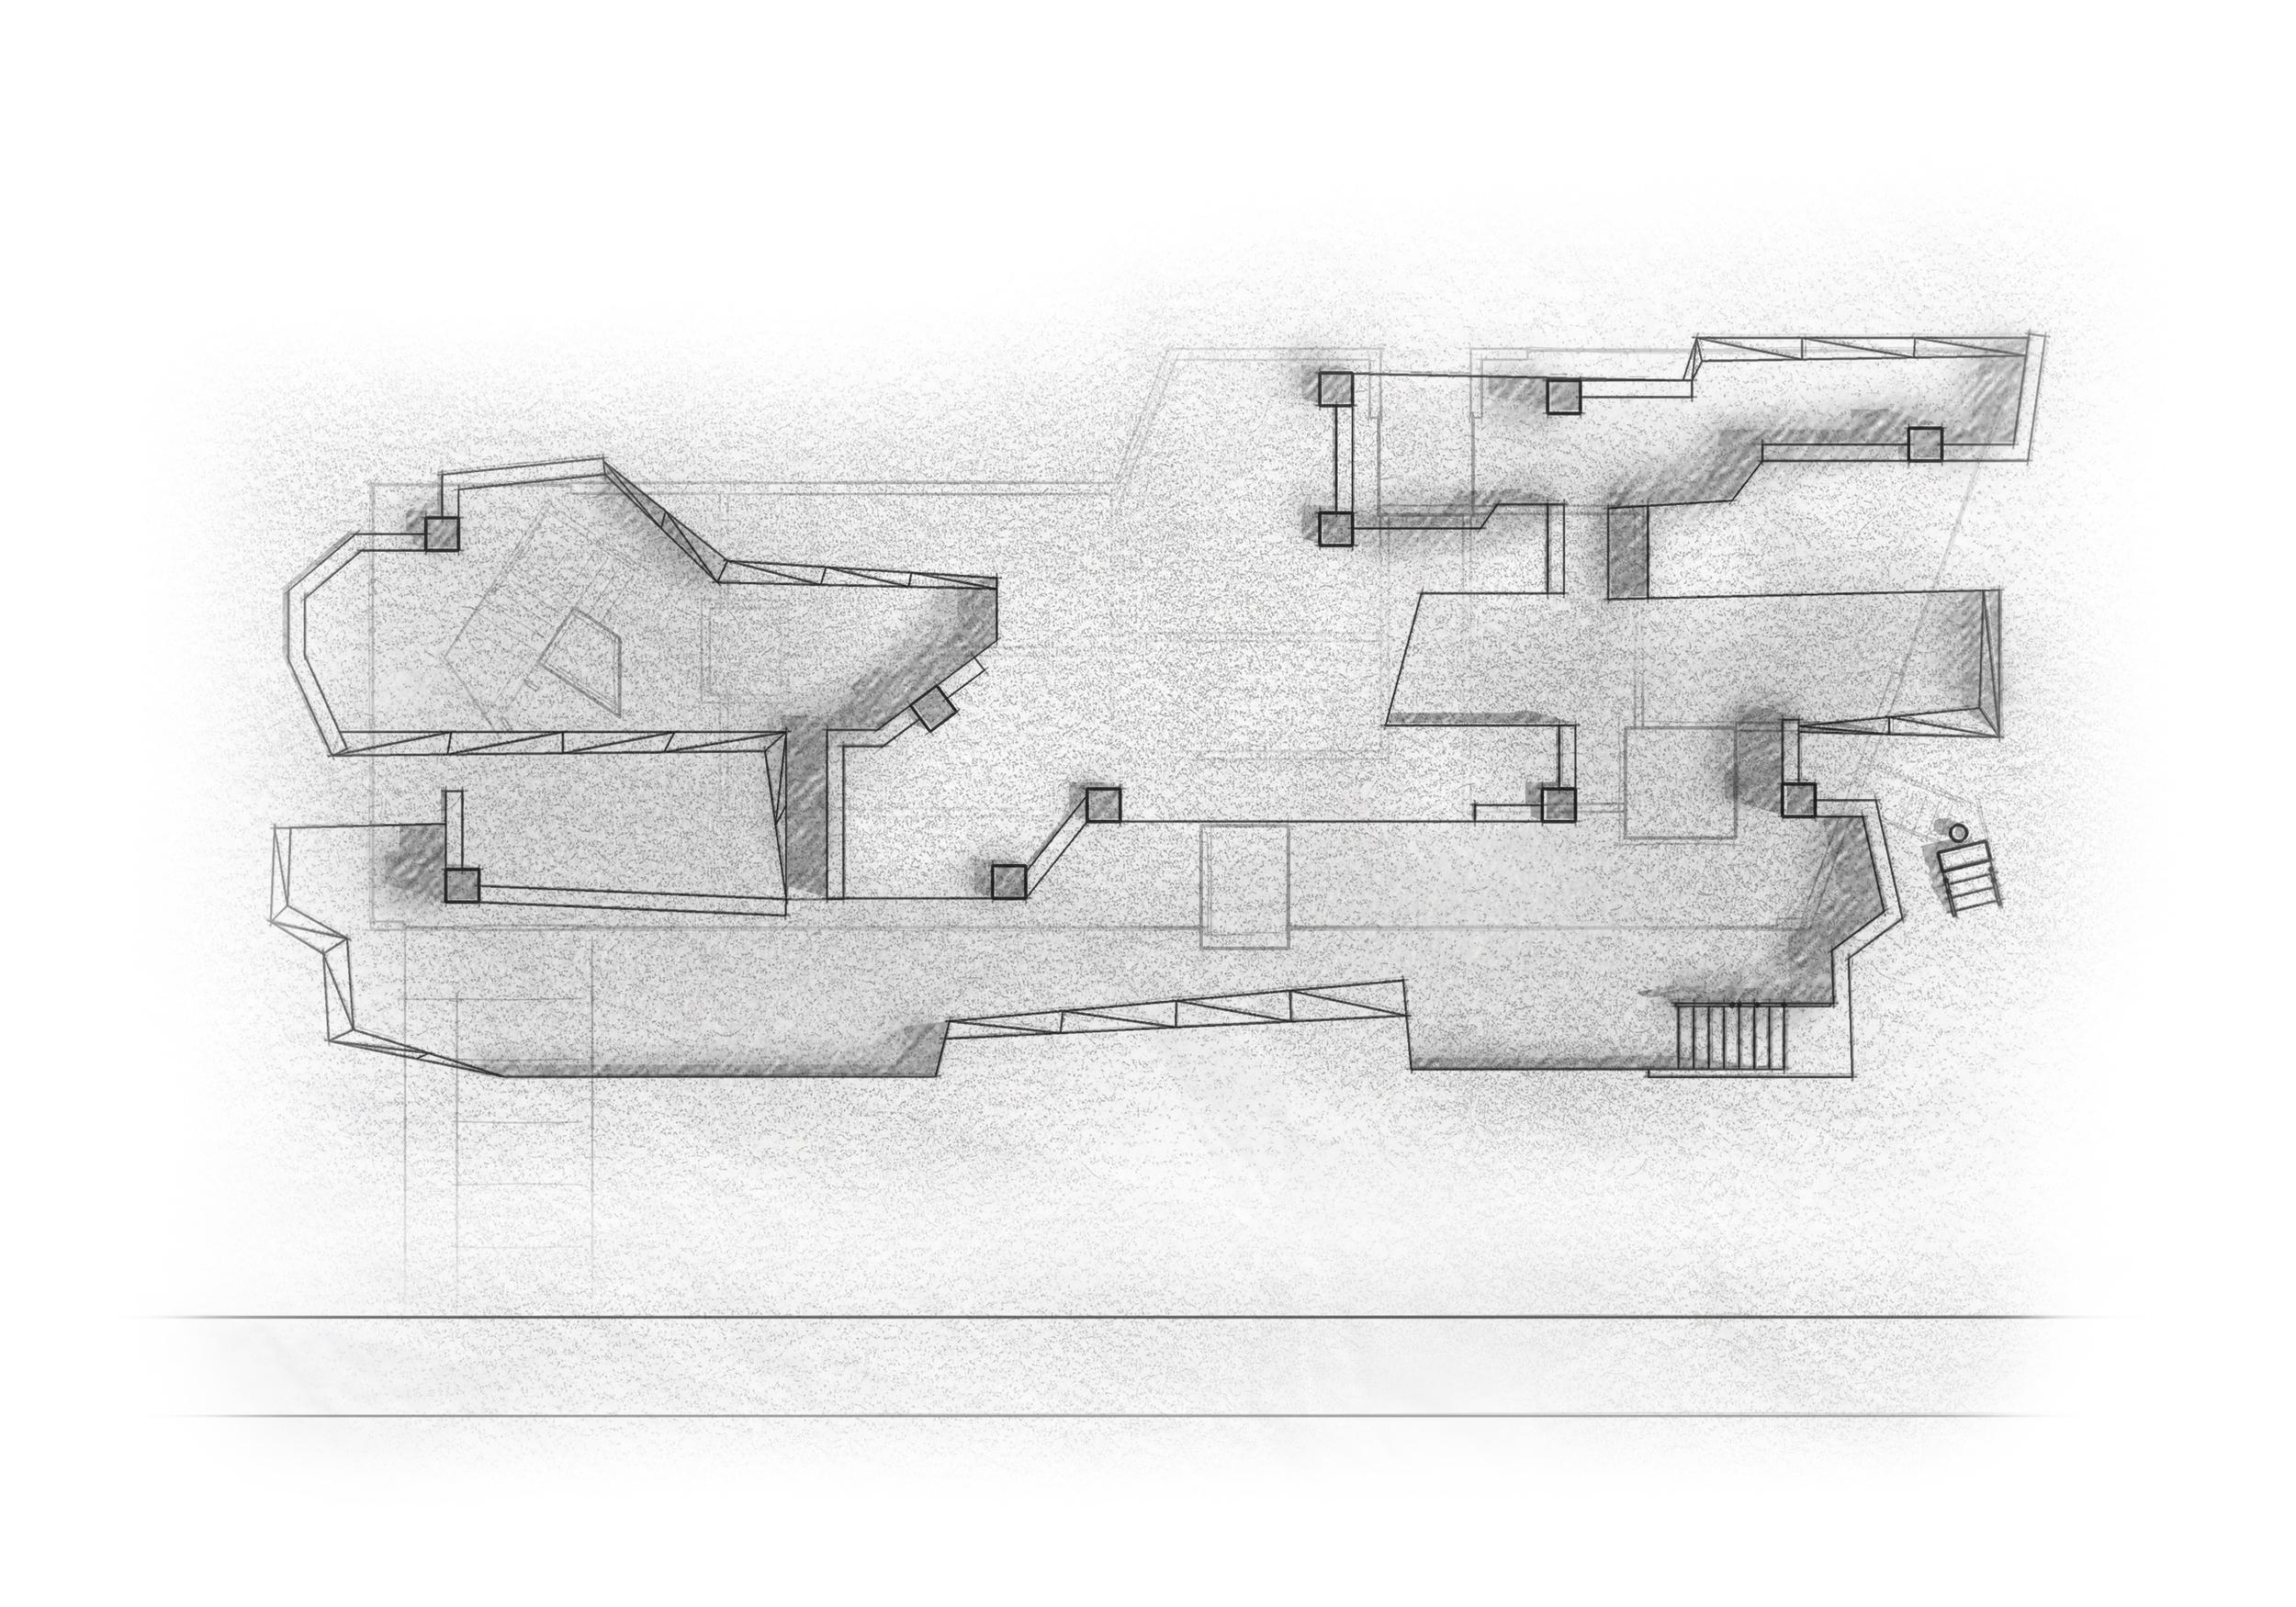 Excavated Site Plan